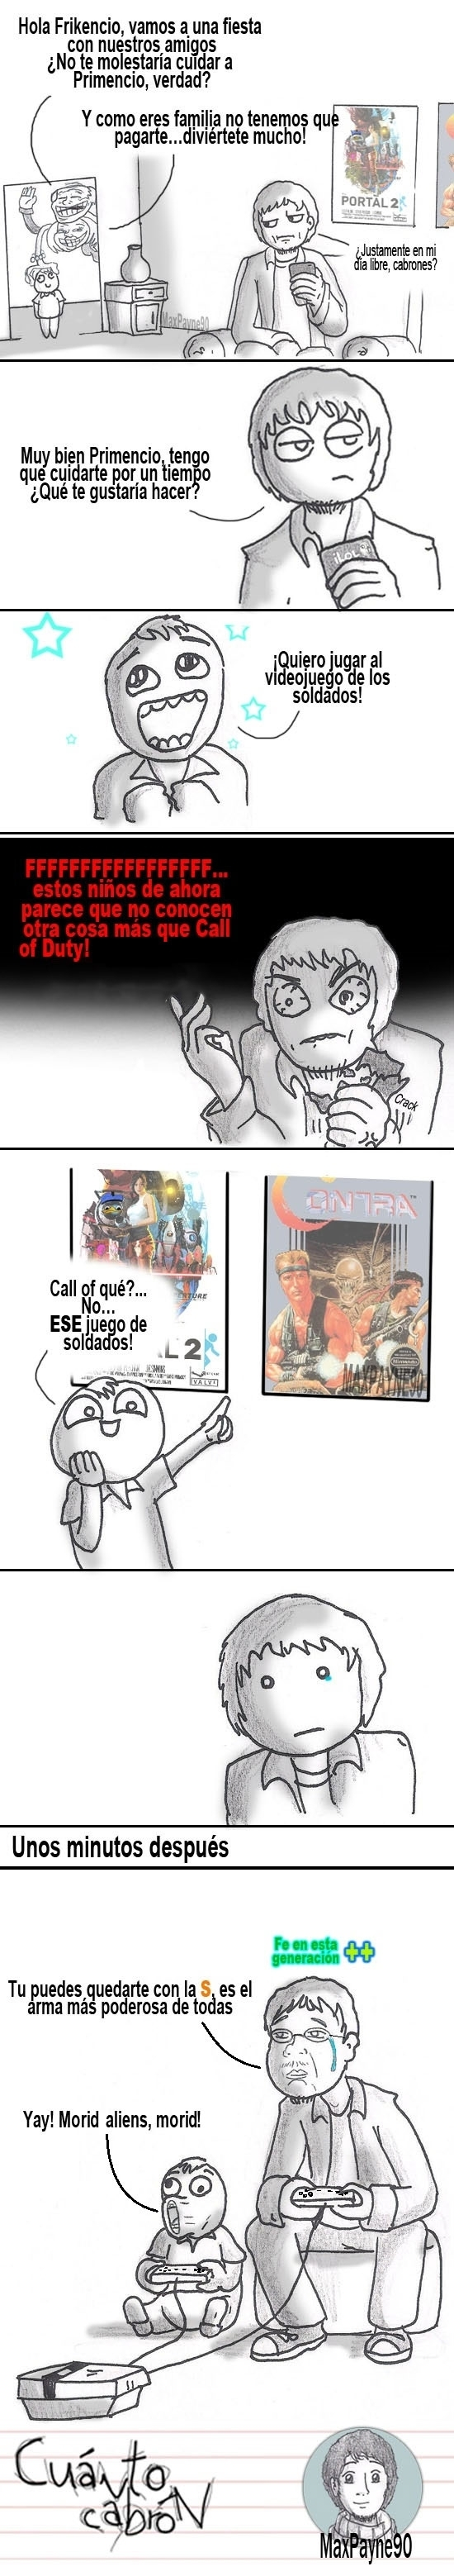 call of duty,Contra,friki,nes,nintendo,Primo,soldados,temavideojuegos,videojuegos